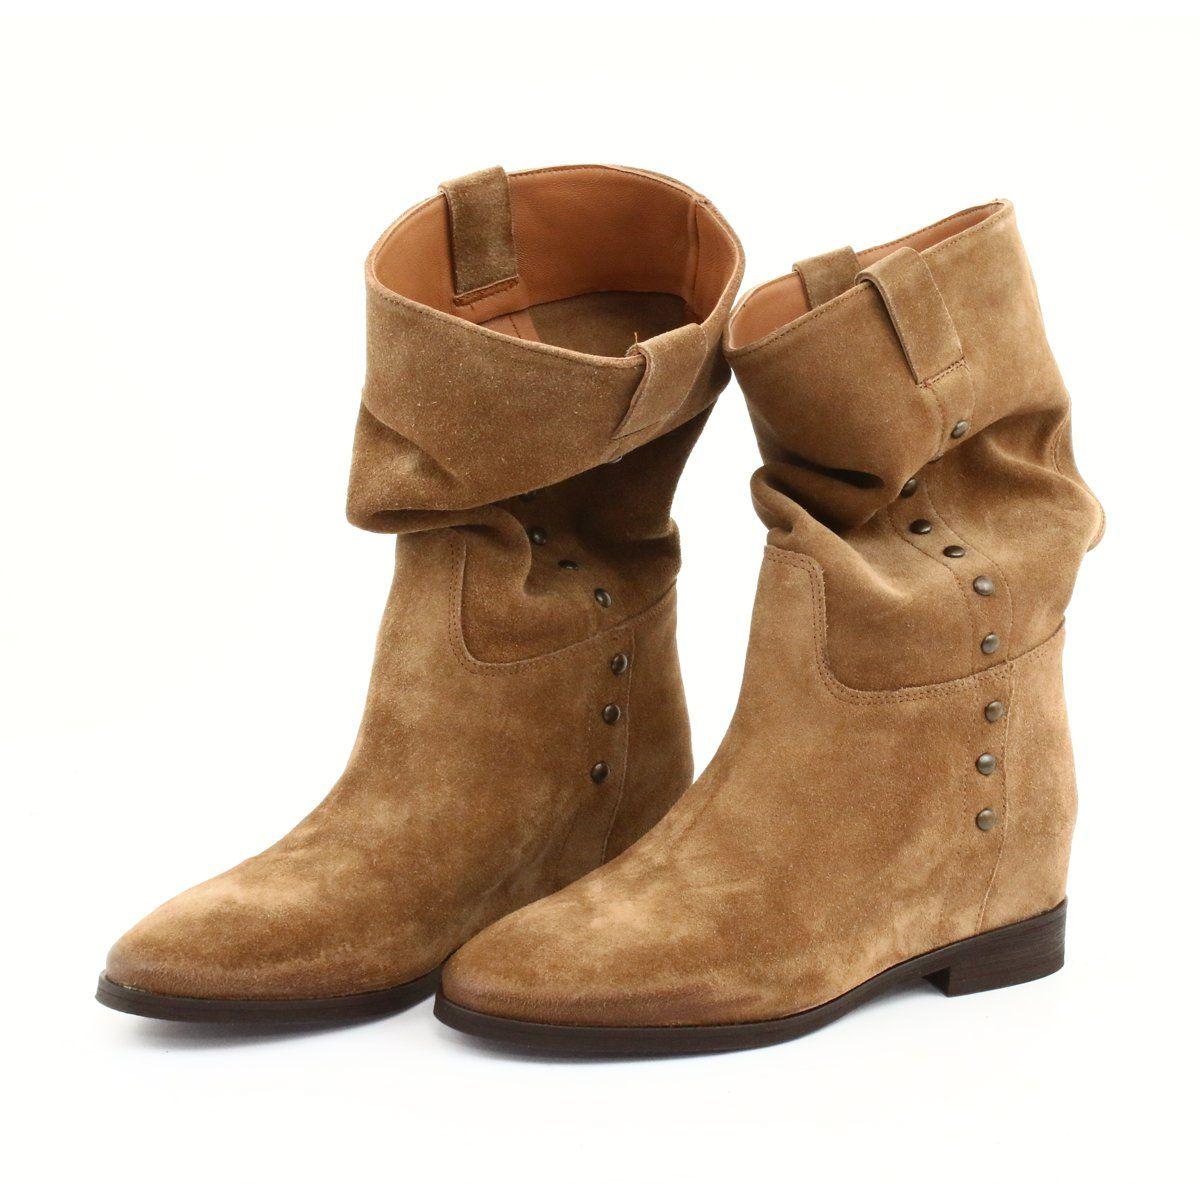 Zamszowe Botki Na Koturnie Badura 9441 Brazowe Boots Suede Boots Boot Shoes Women